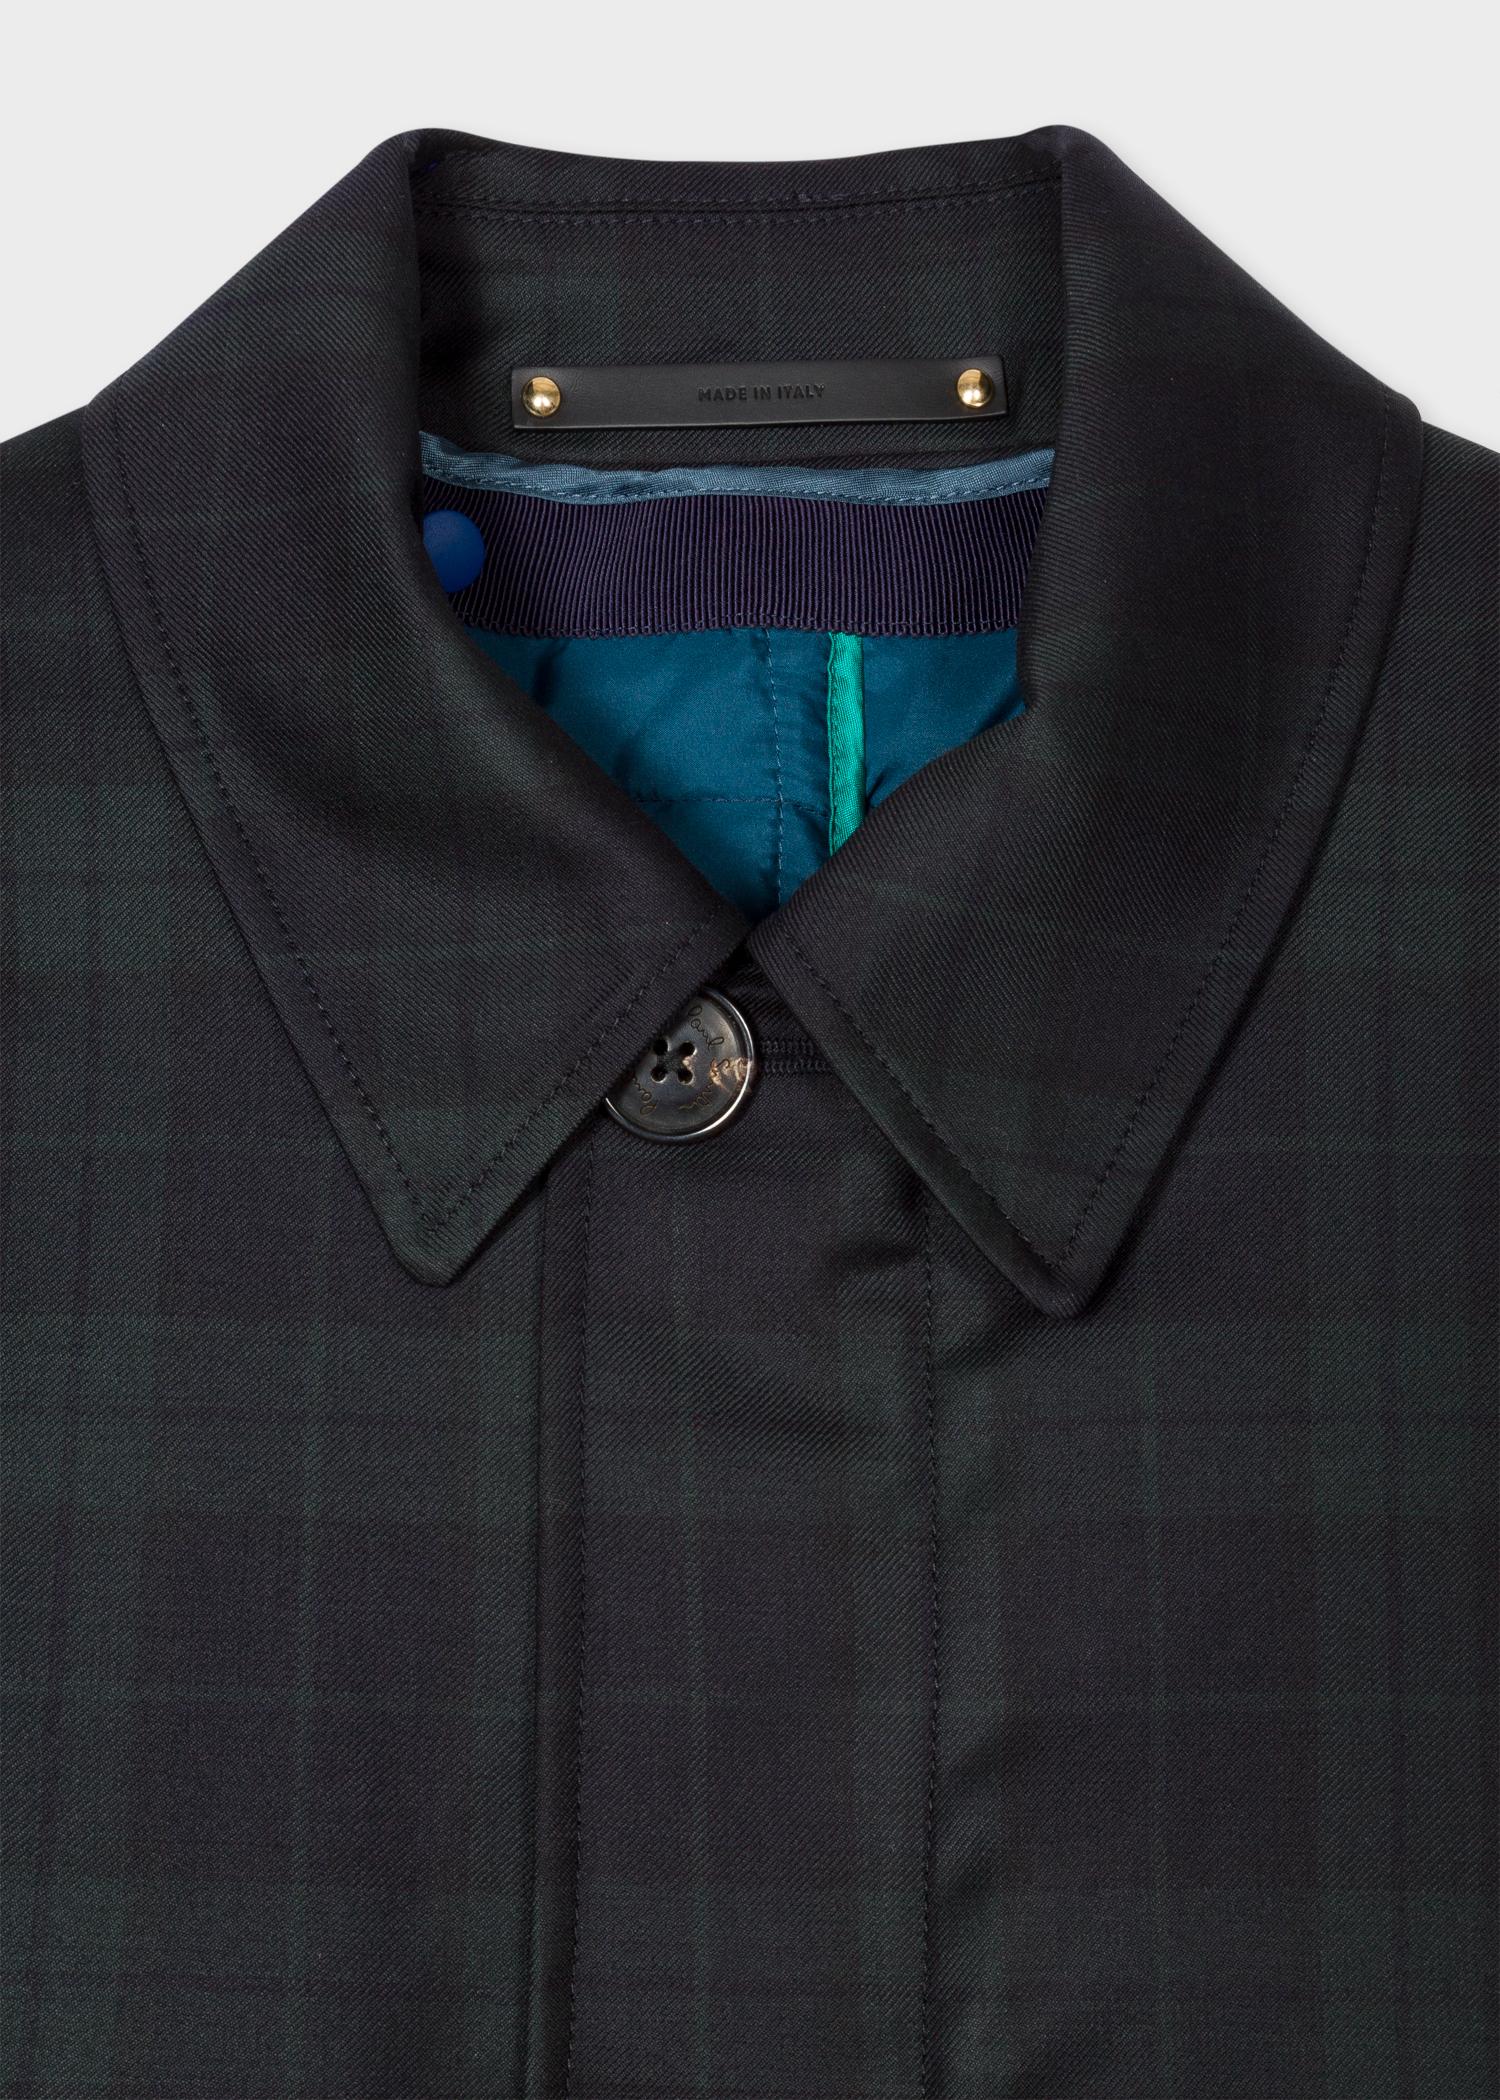 3dfdab261 Men's Navy Black Watch Check Loro Piana Wool Mac With Detachable Gilet